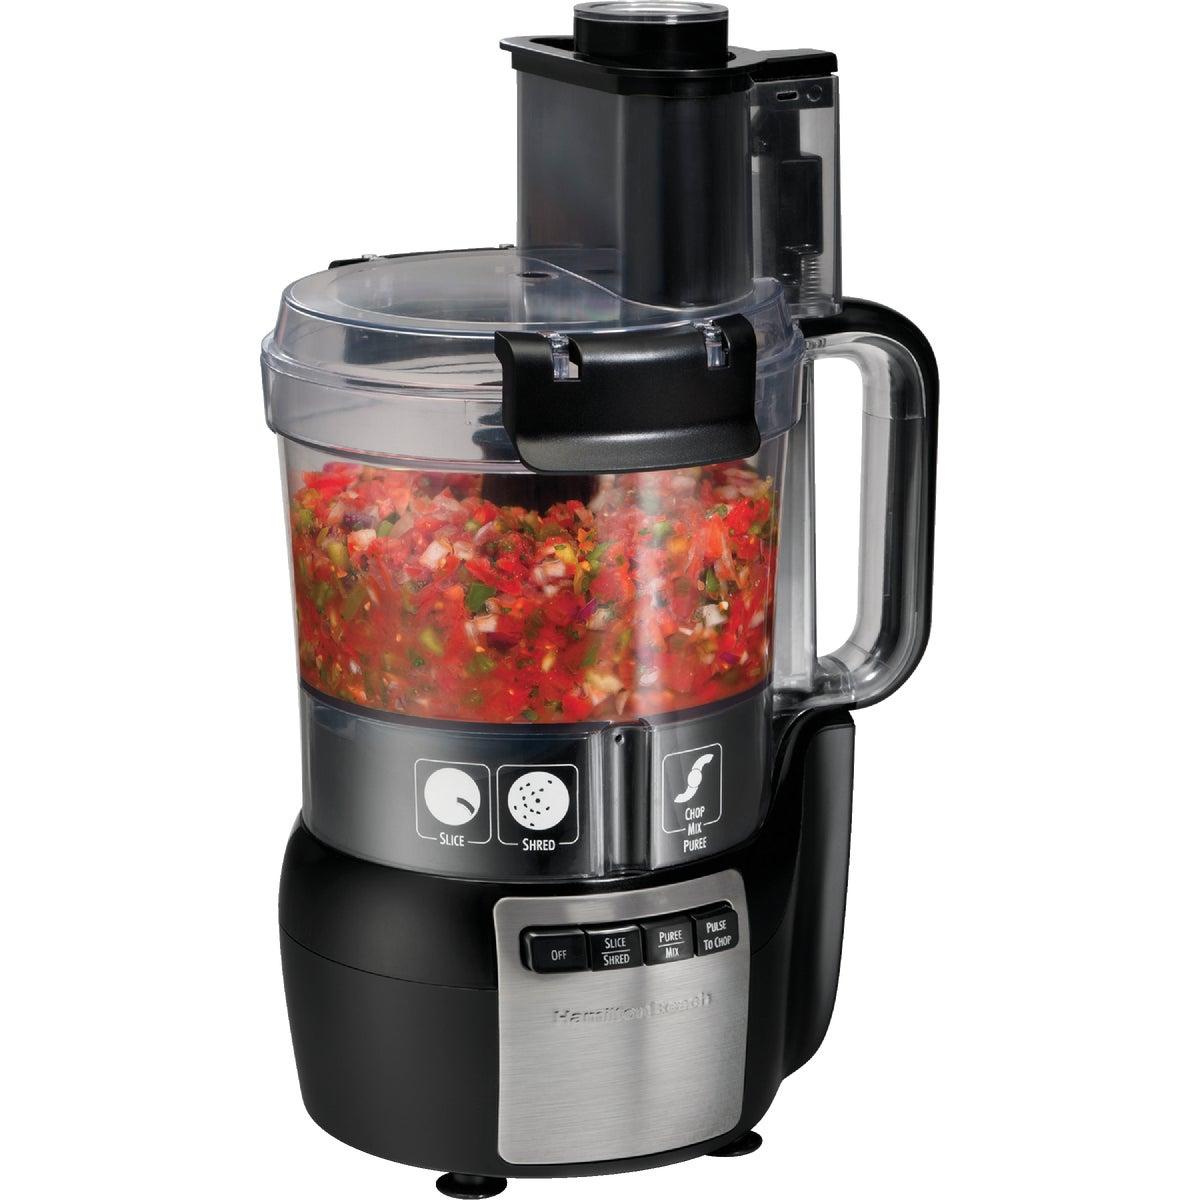 Hamilton Beach Stack & Snap 10 Cup Food Processor 70720